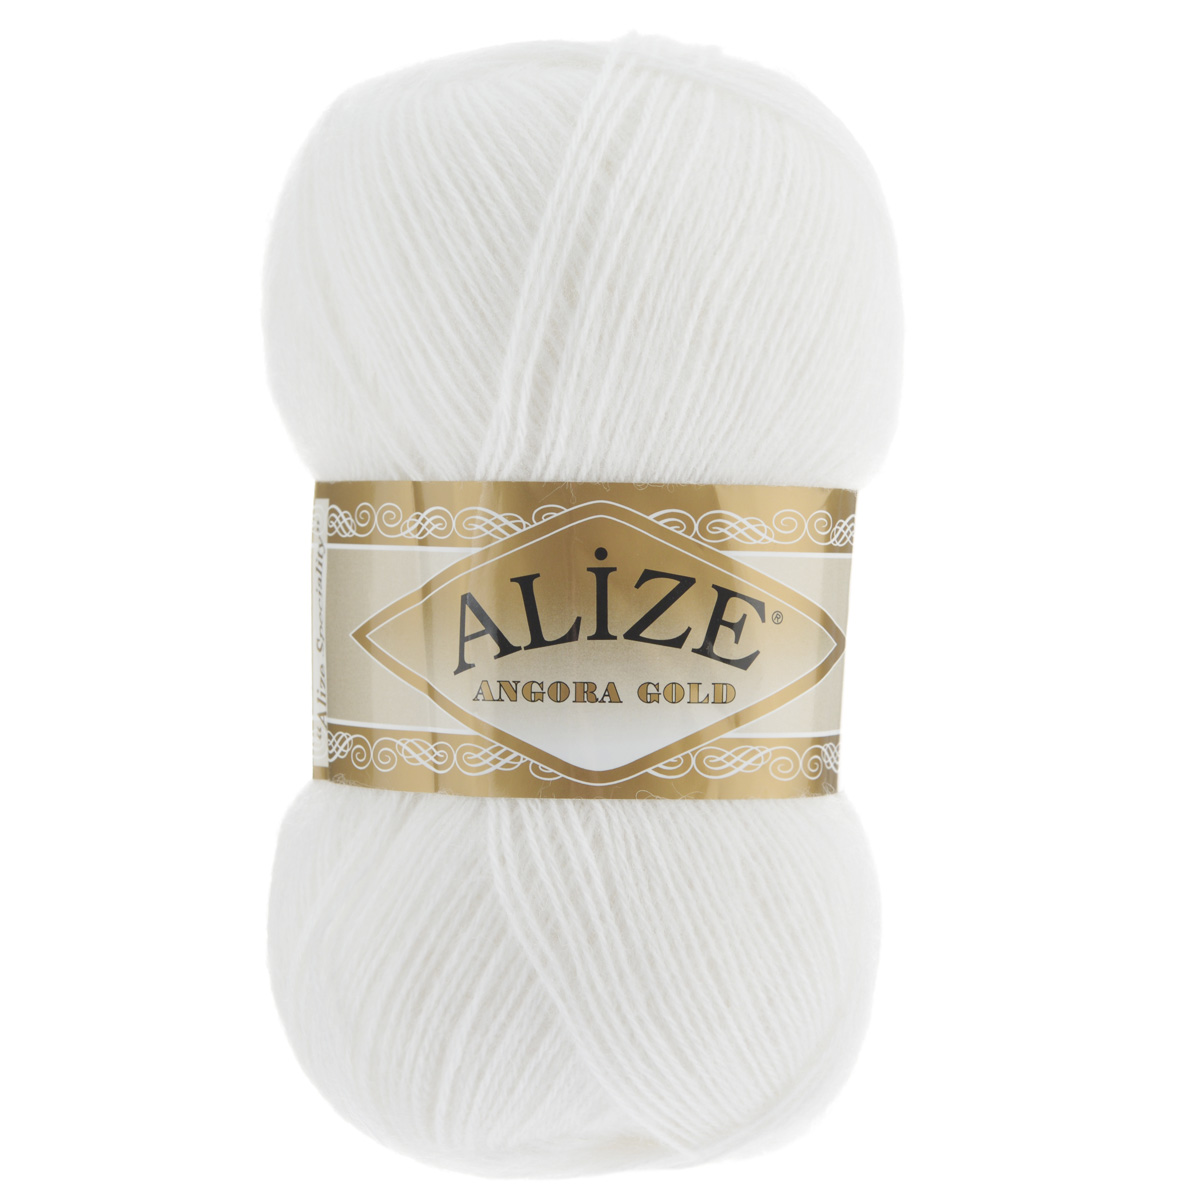 "Пряжа для вязания Alize ""Angora Gold"", цвет: белый (55), 550 м, 100 г, 5 шт"